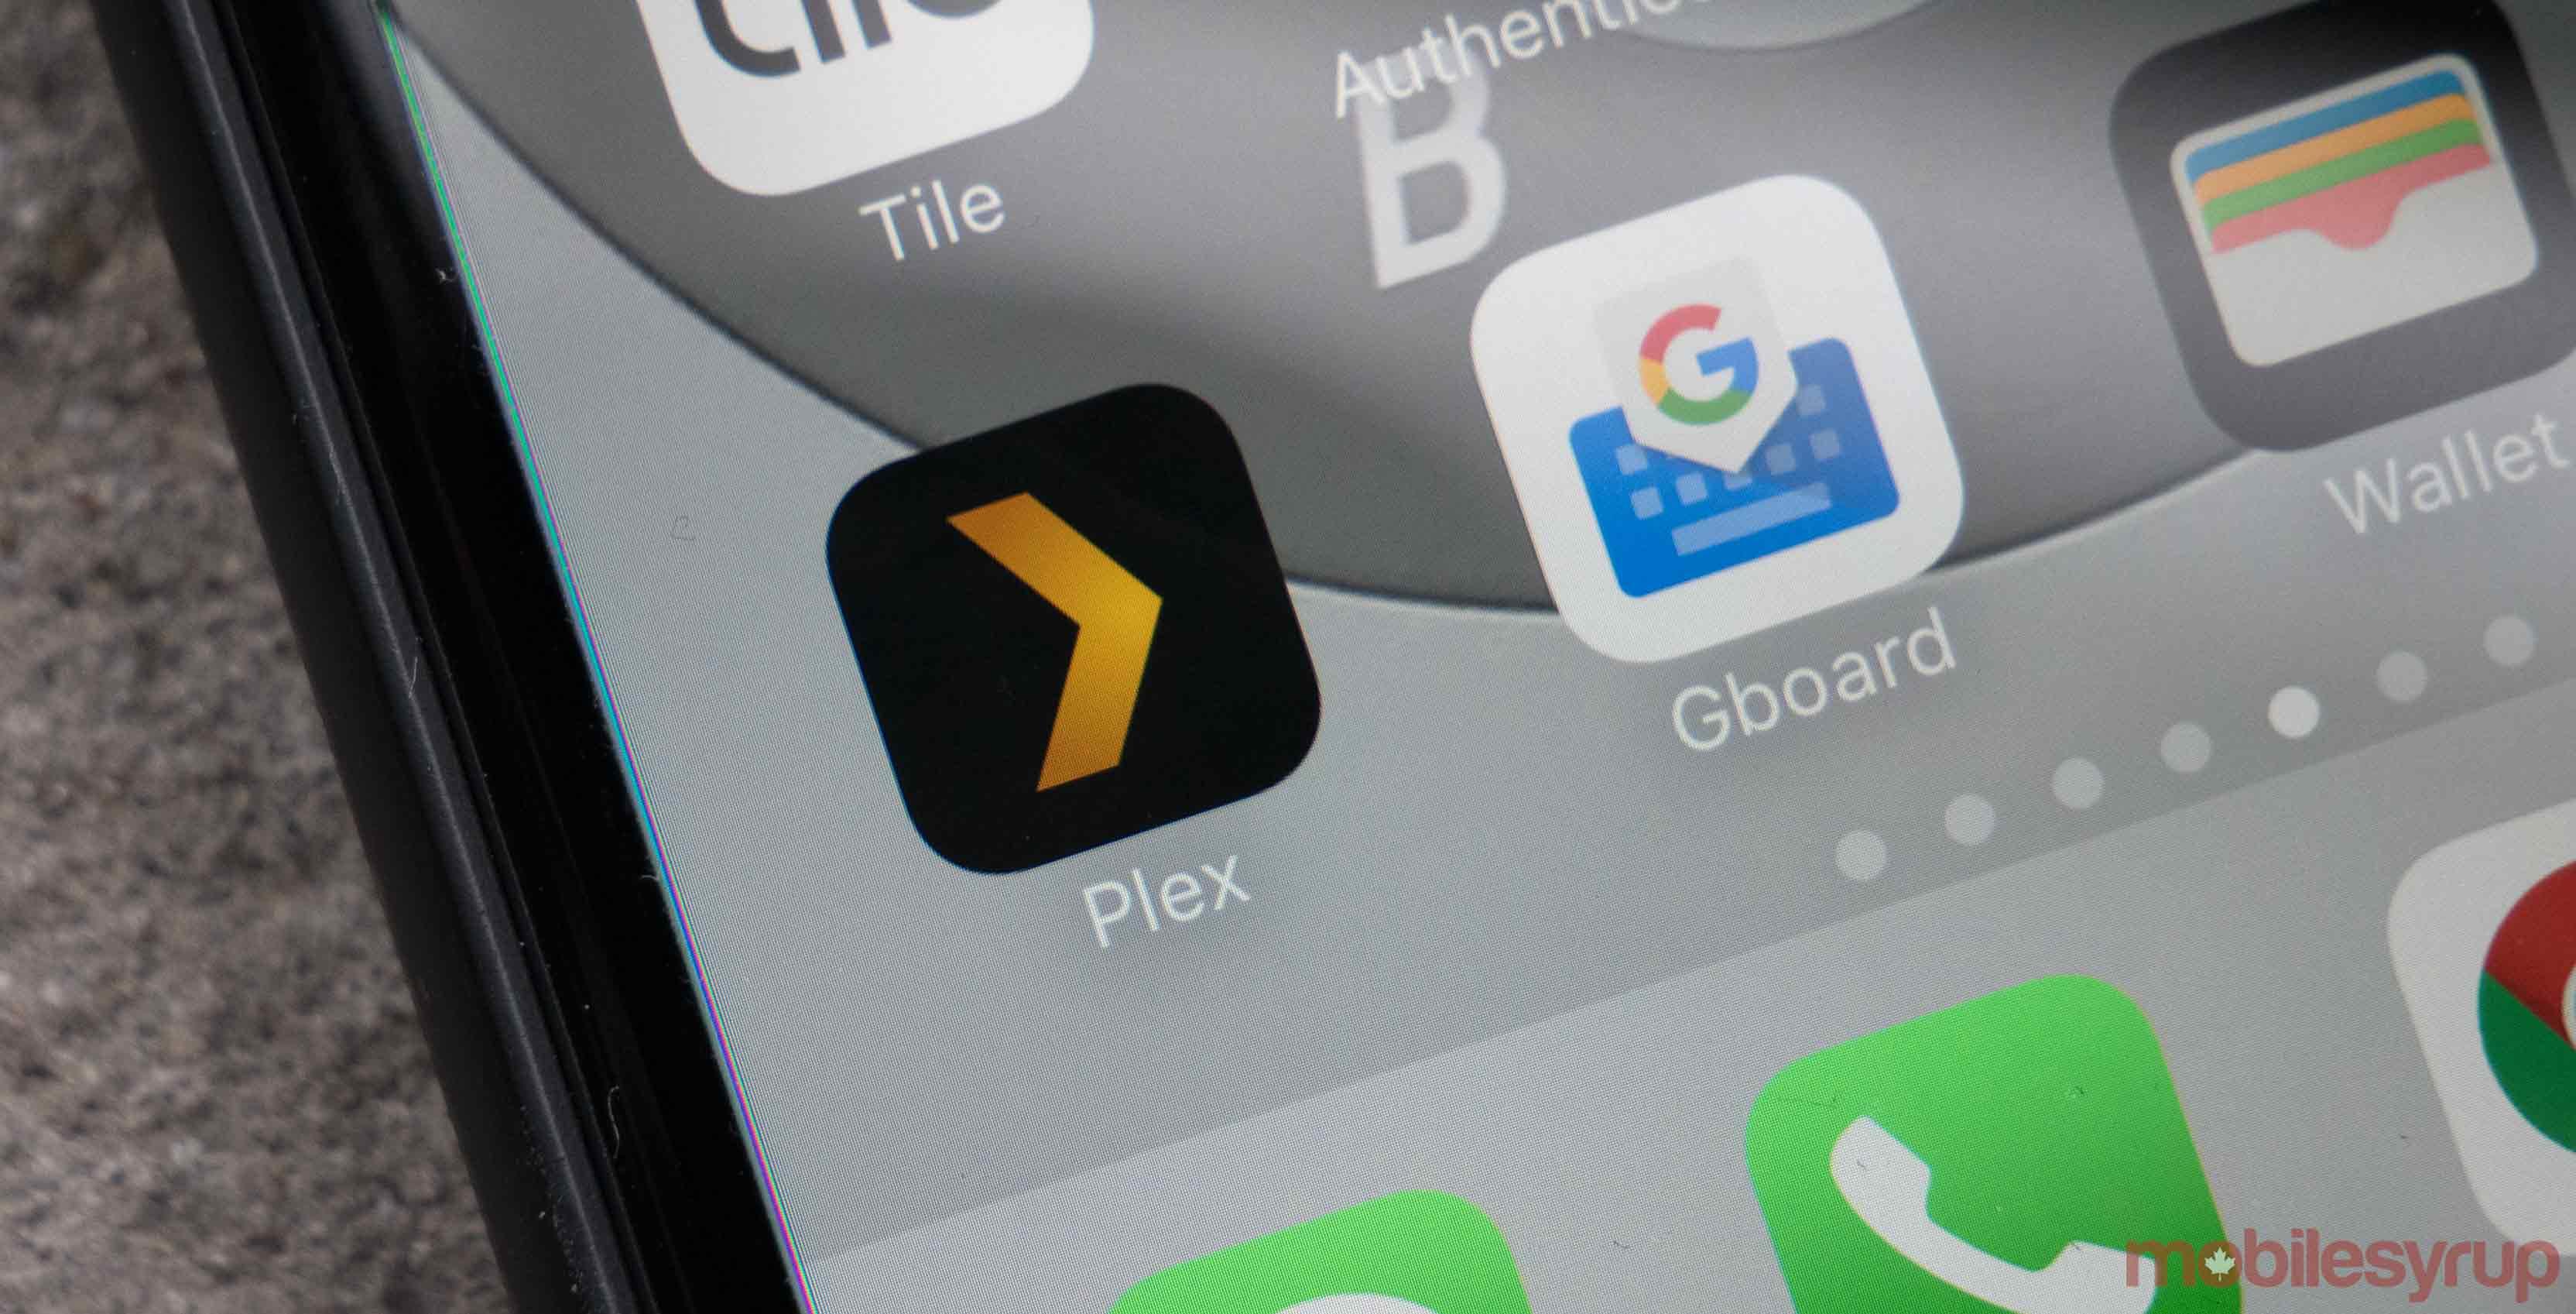 Plex App on iOS